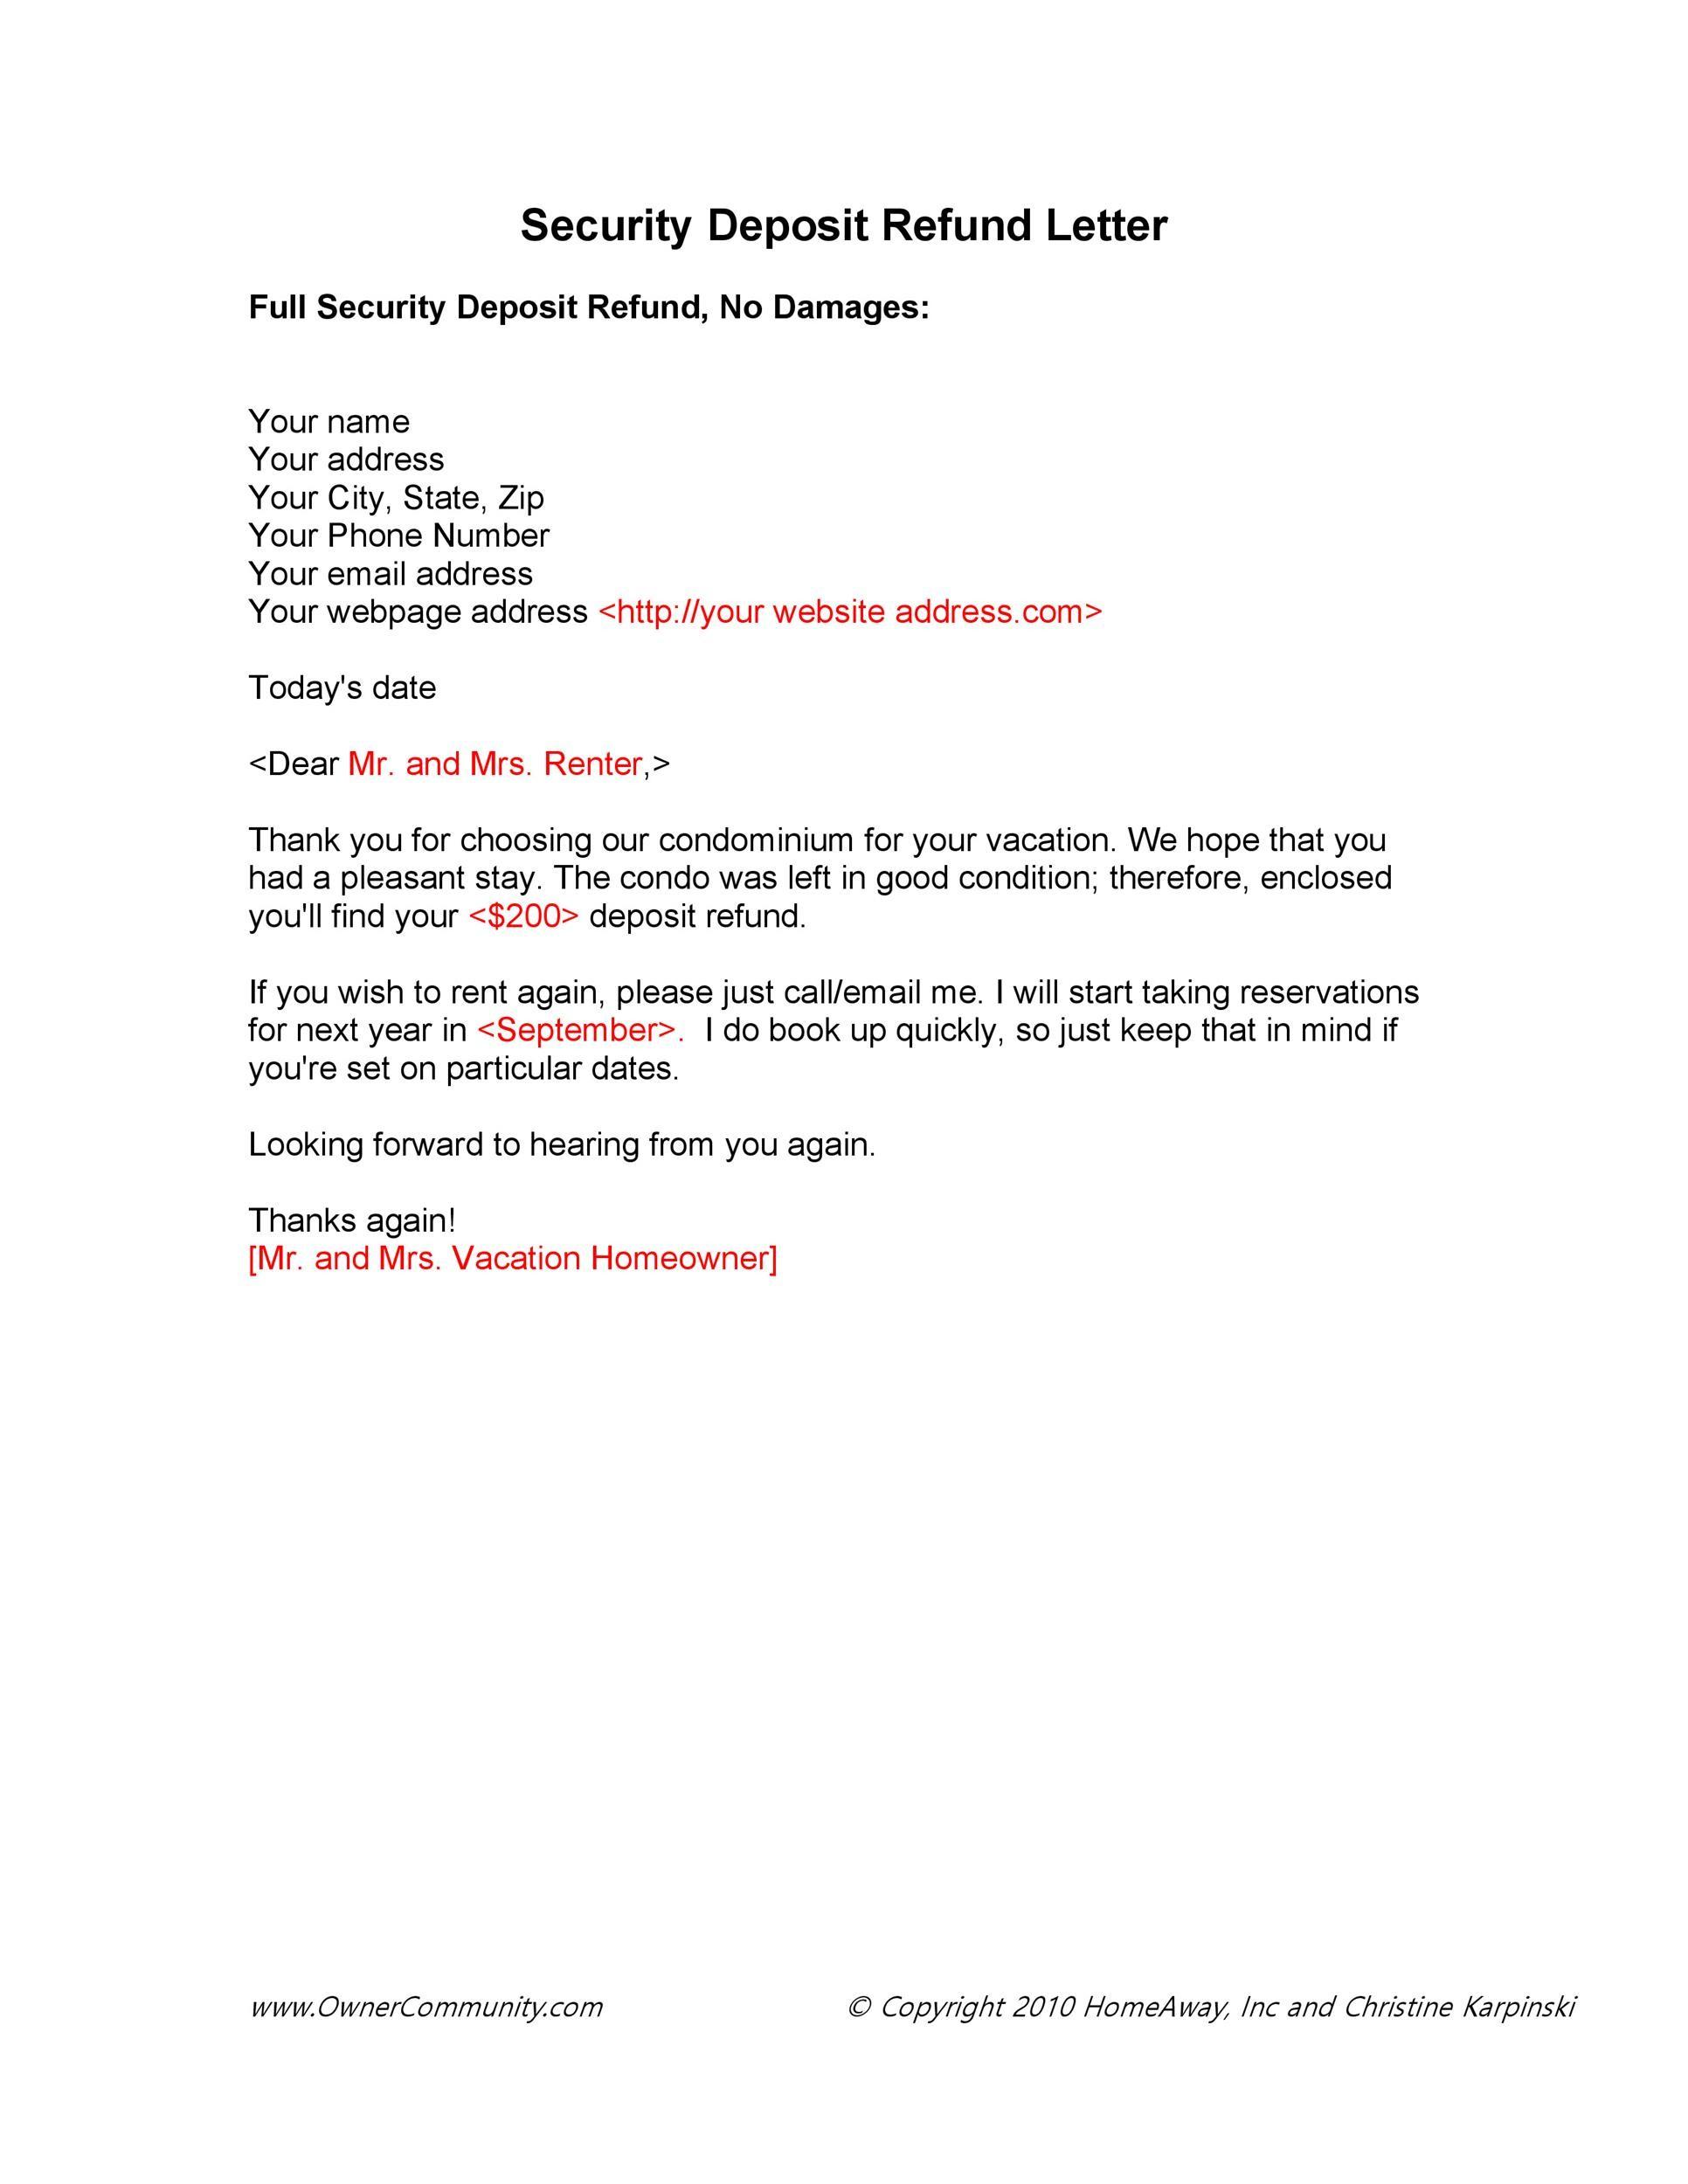 Return Of Deposit From Landlord Letter from templatelab.com